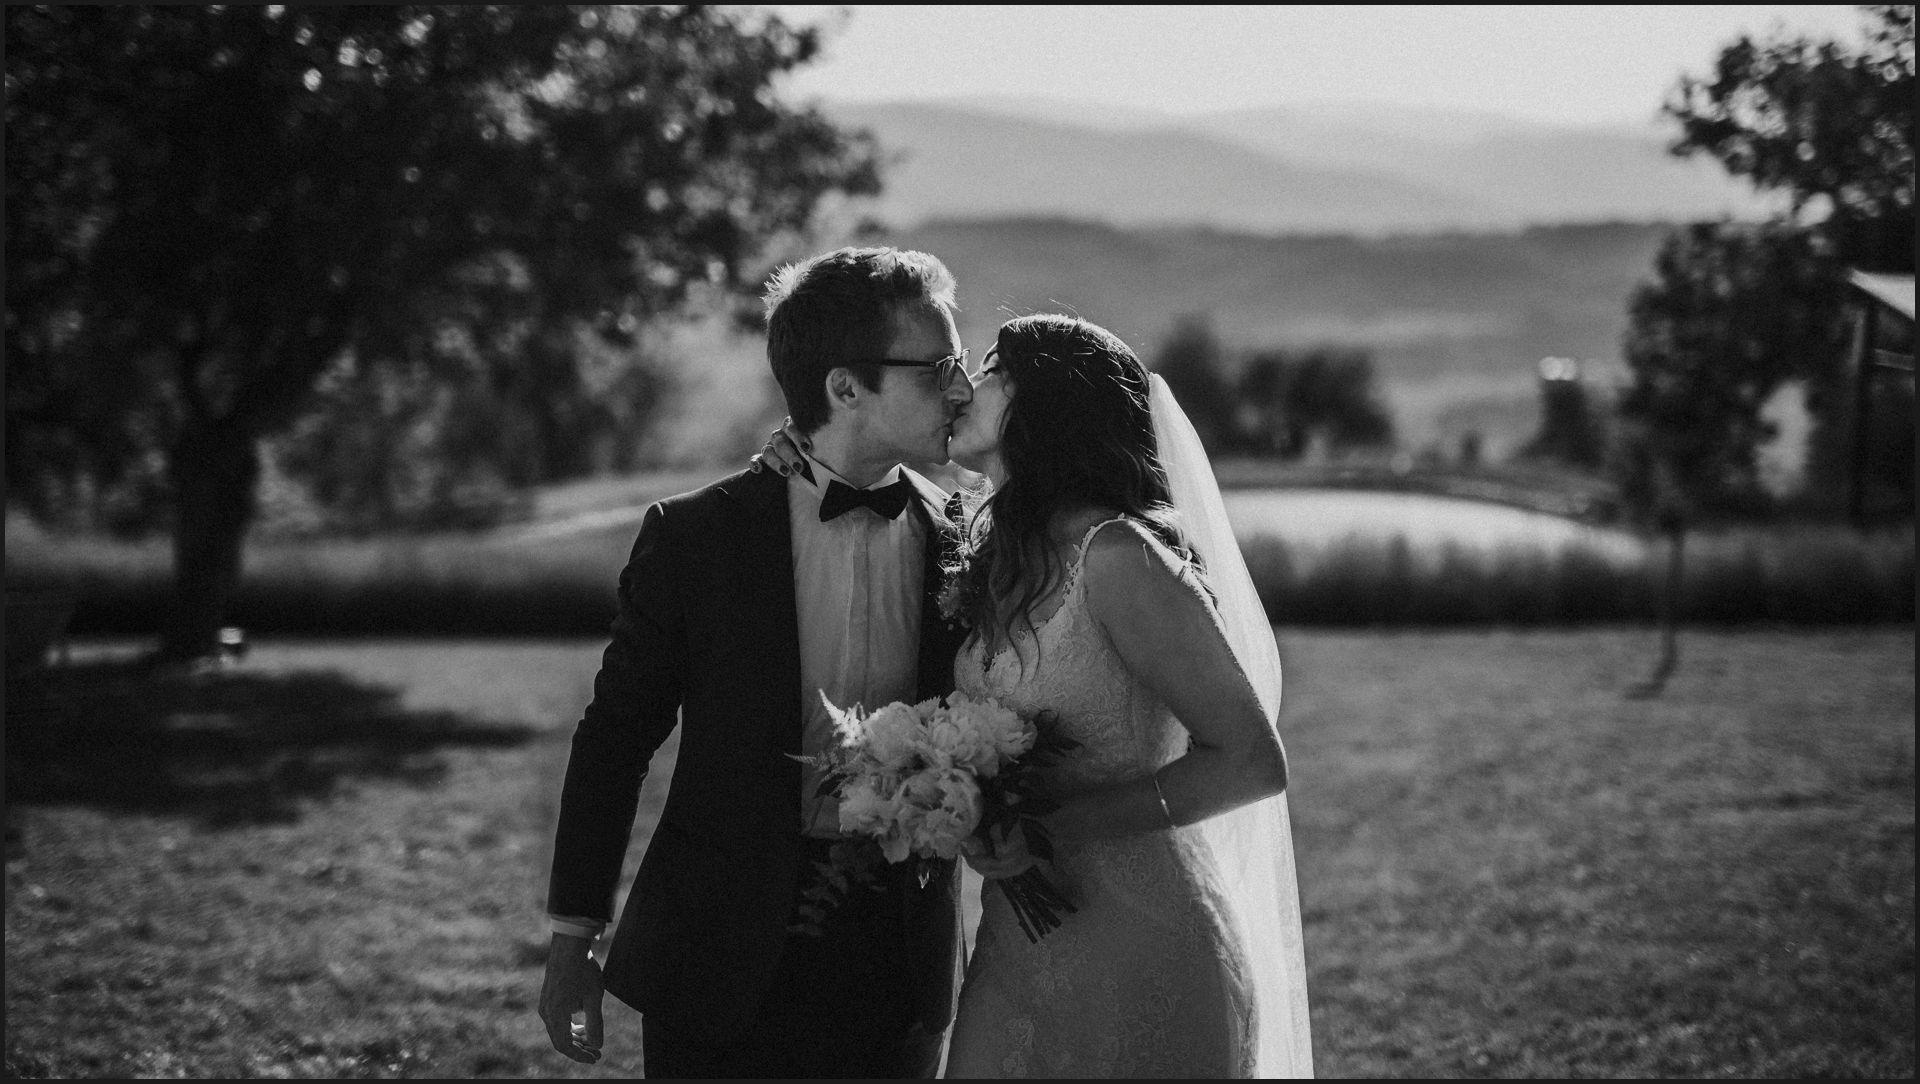 black and white, wedding, umbria, nikis resort, bride, groom, kiss, love